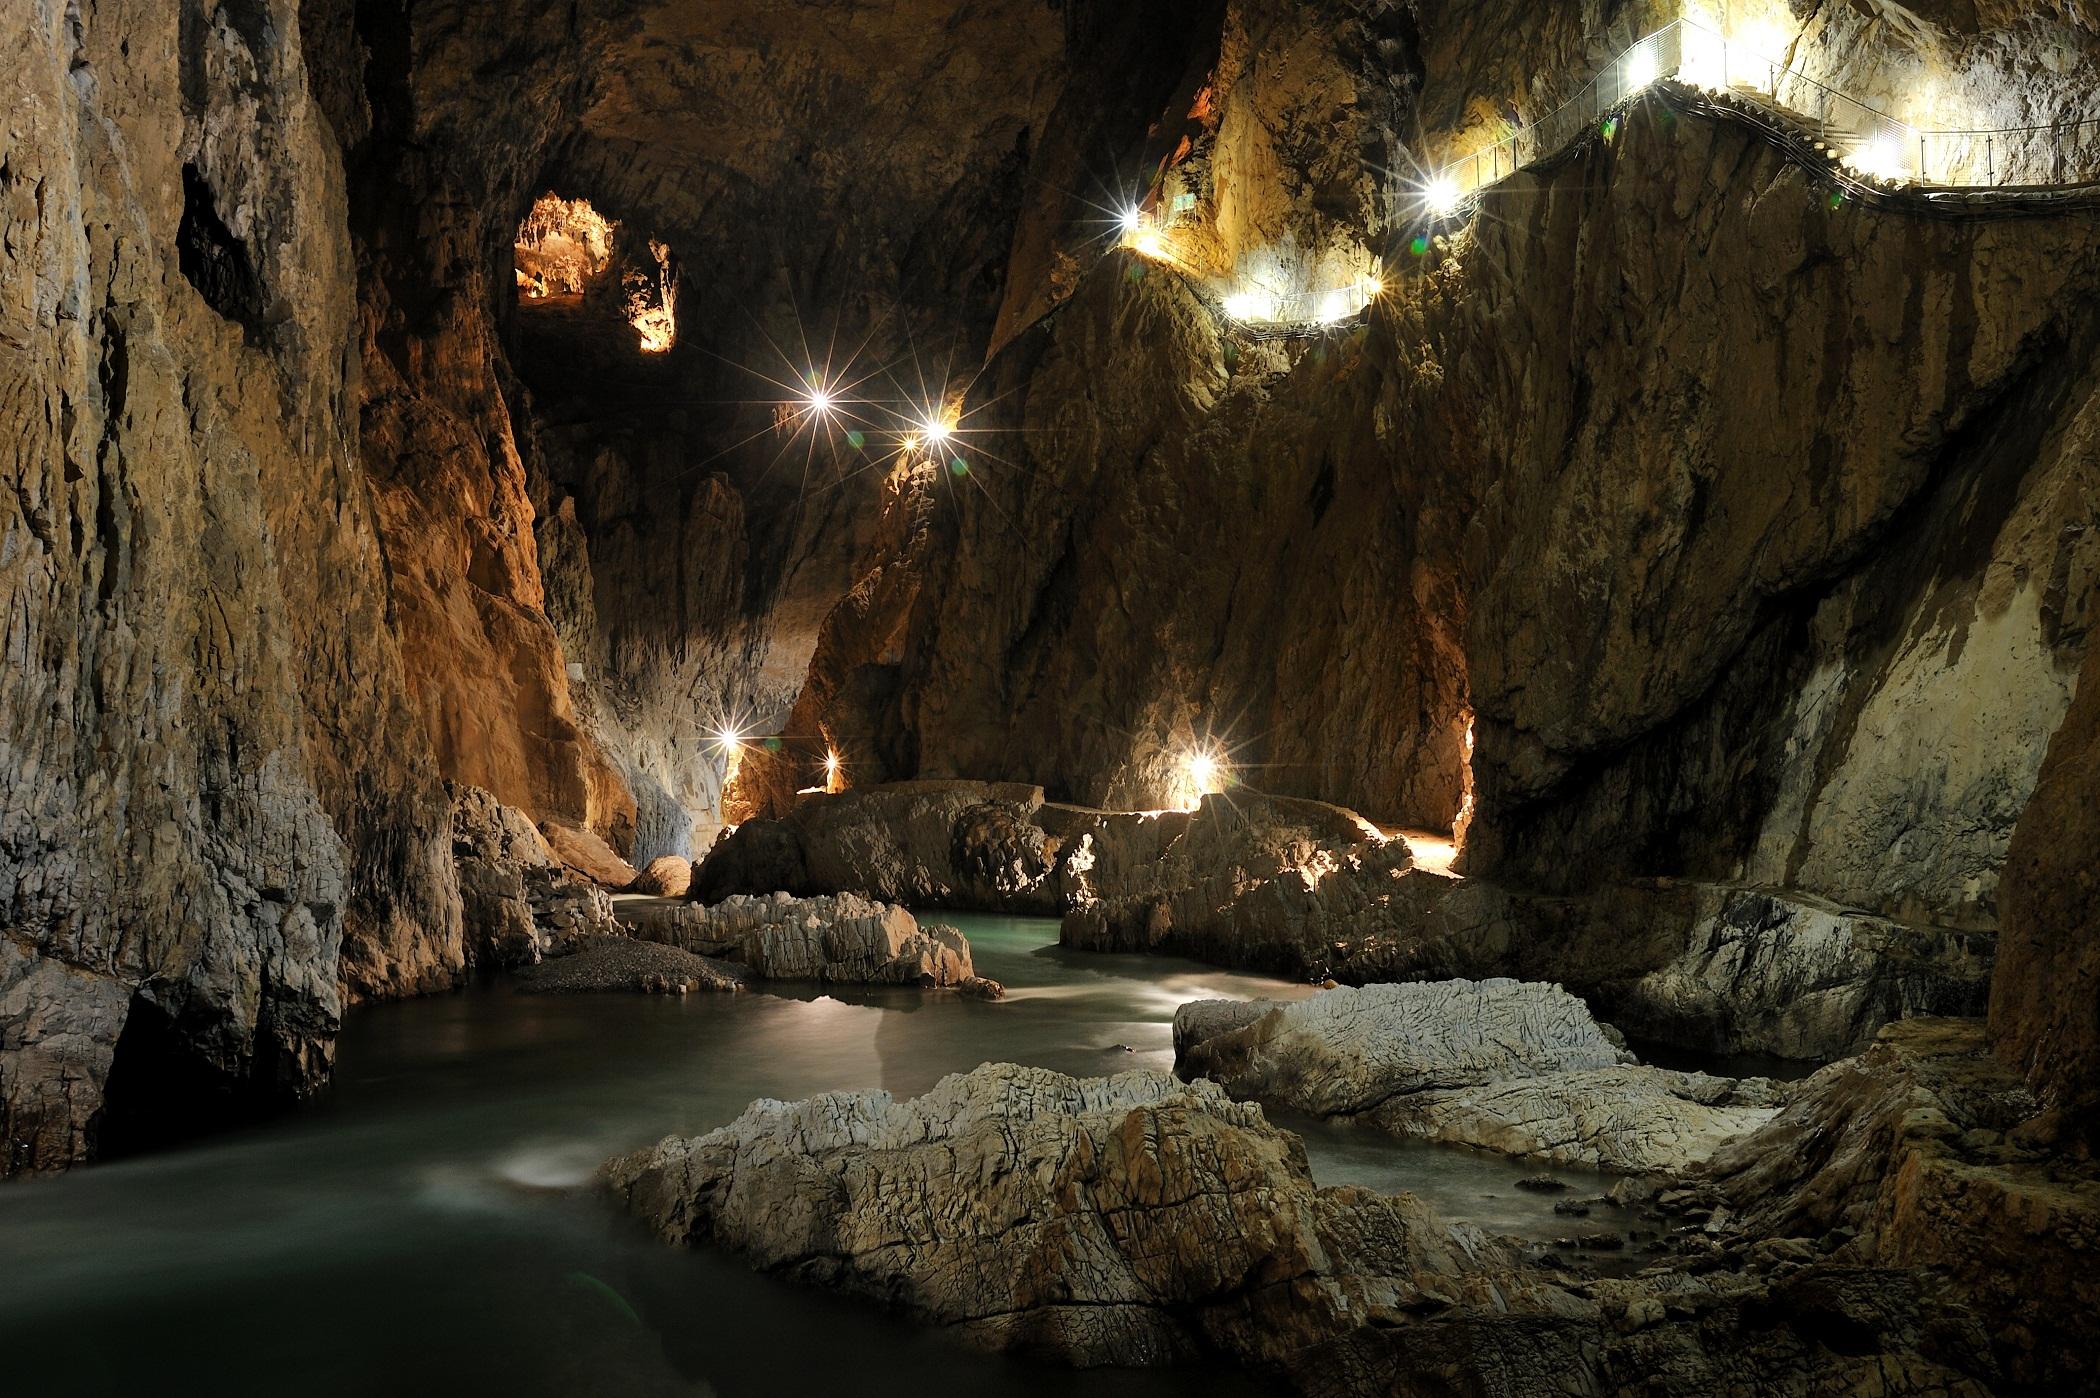 unesco_skocjan_caves